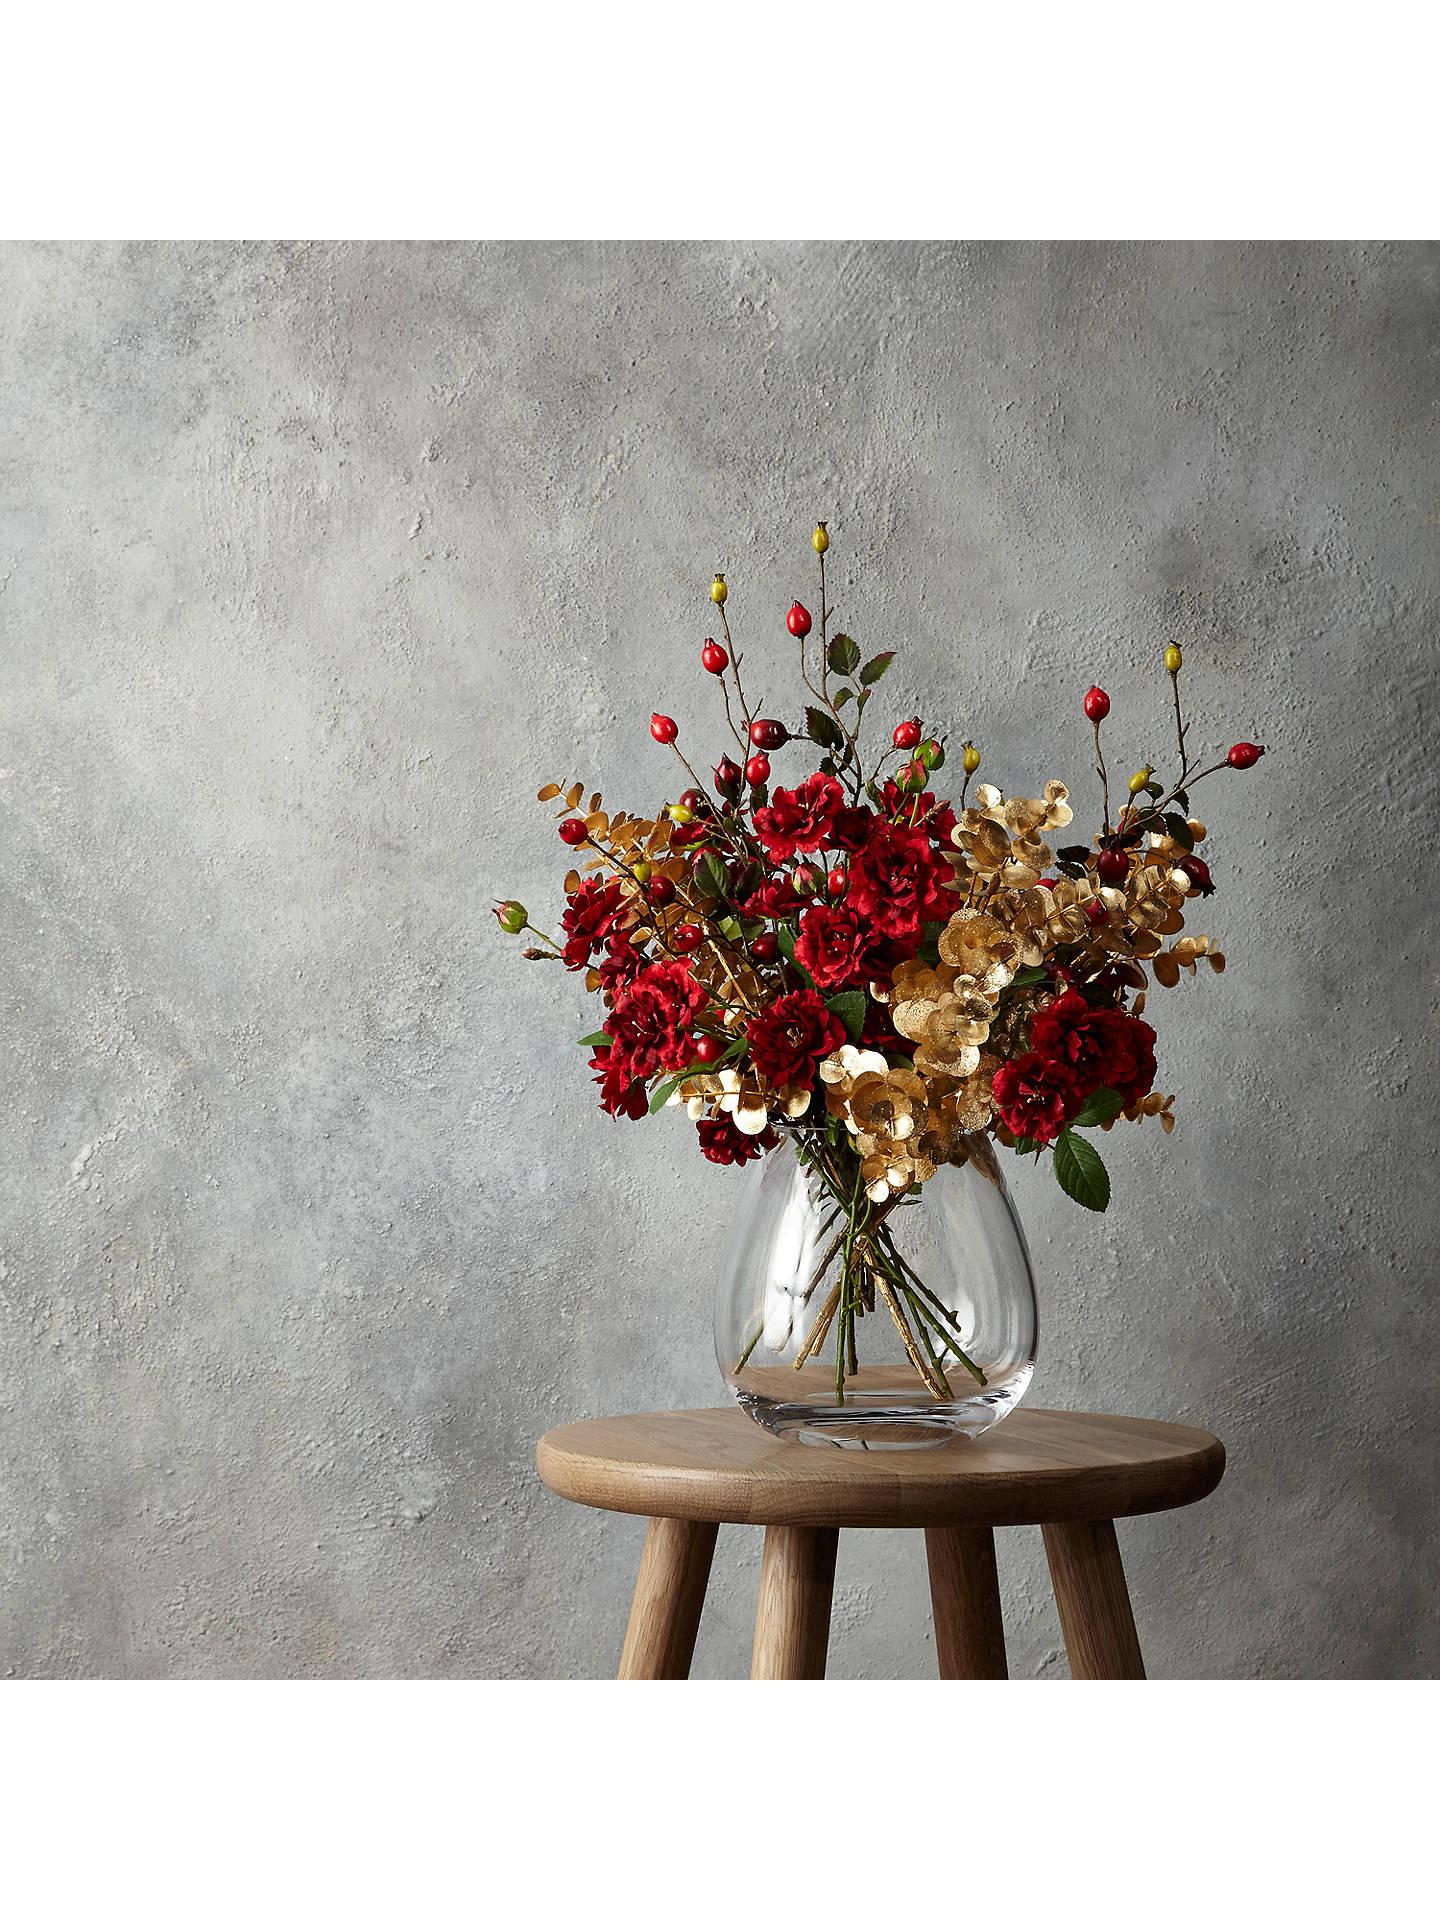 ... BuyLSA Flower Table Bouquet Vase, H17cm Online At Johnlewis.com ...